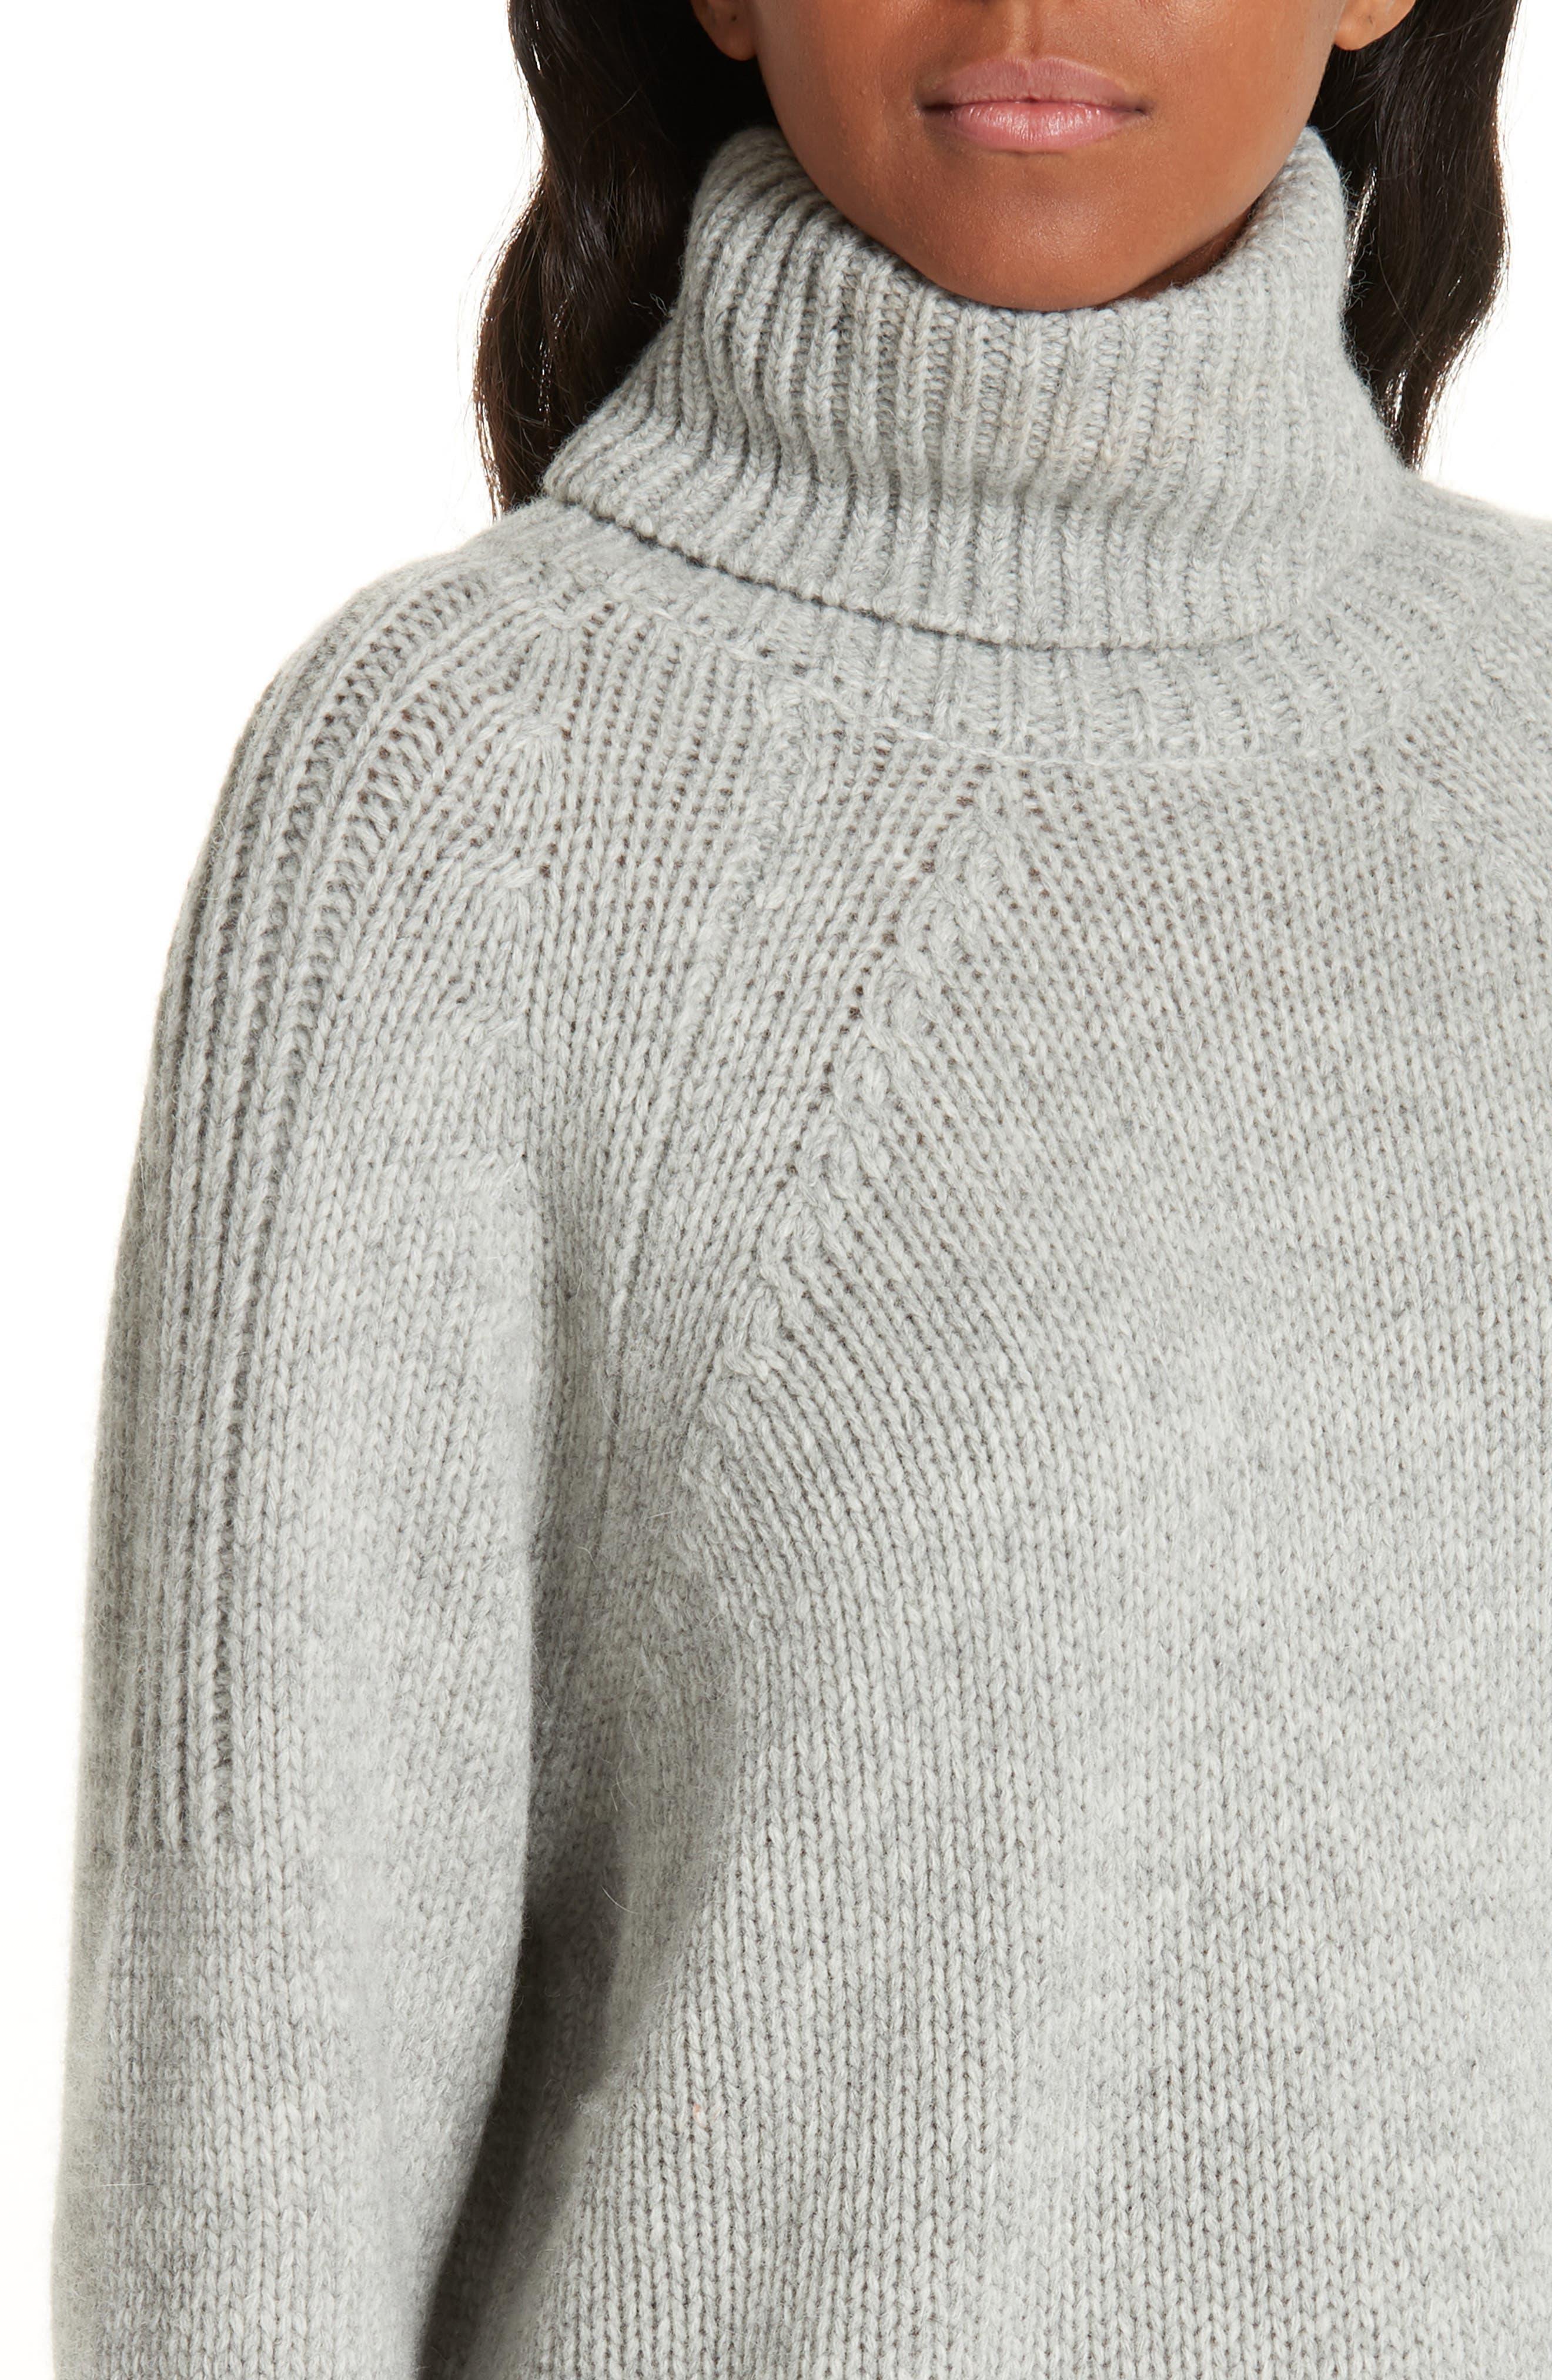 Nagora Sweater,                             Alternate thumbnail 4, color,                             020